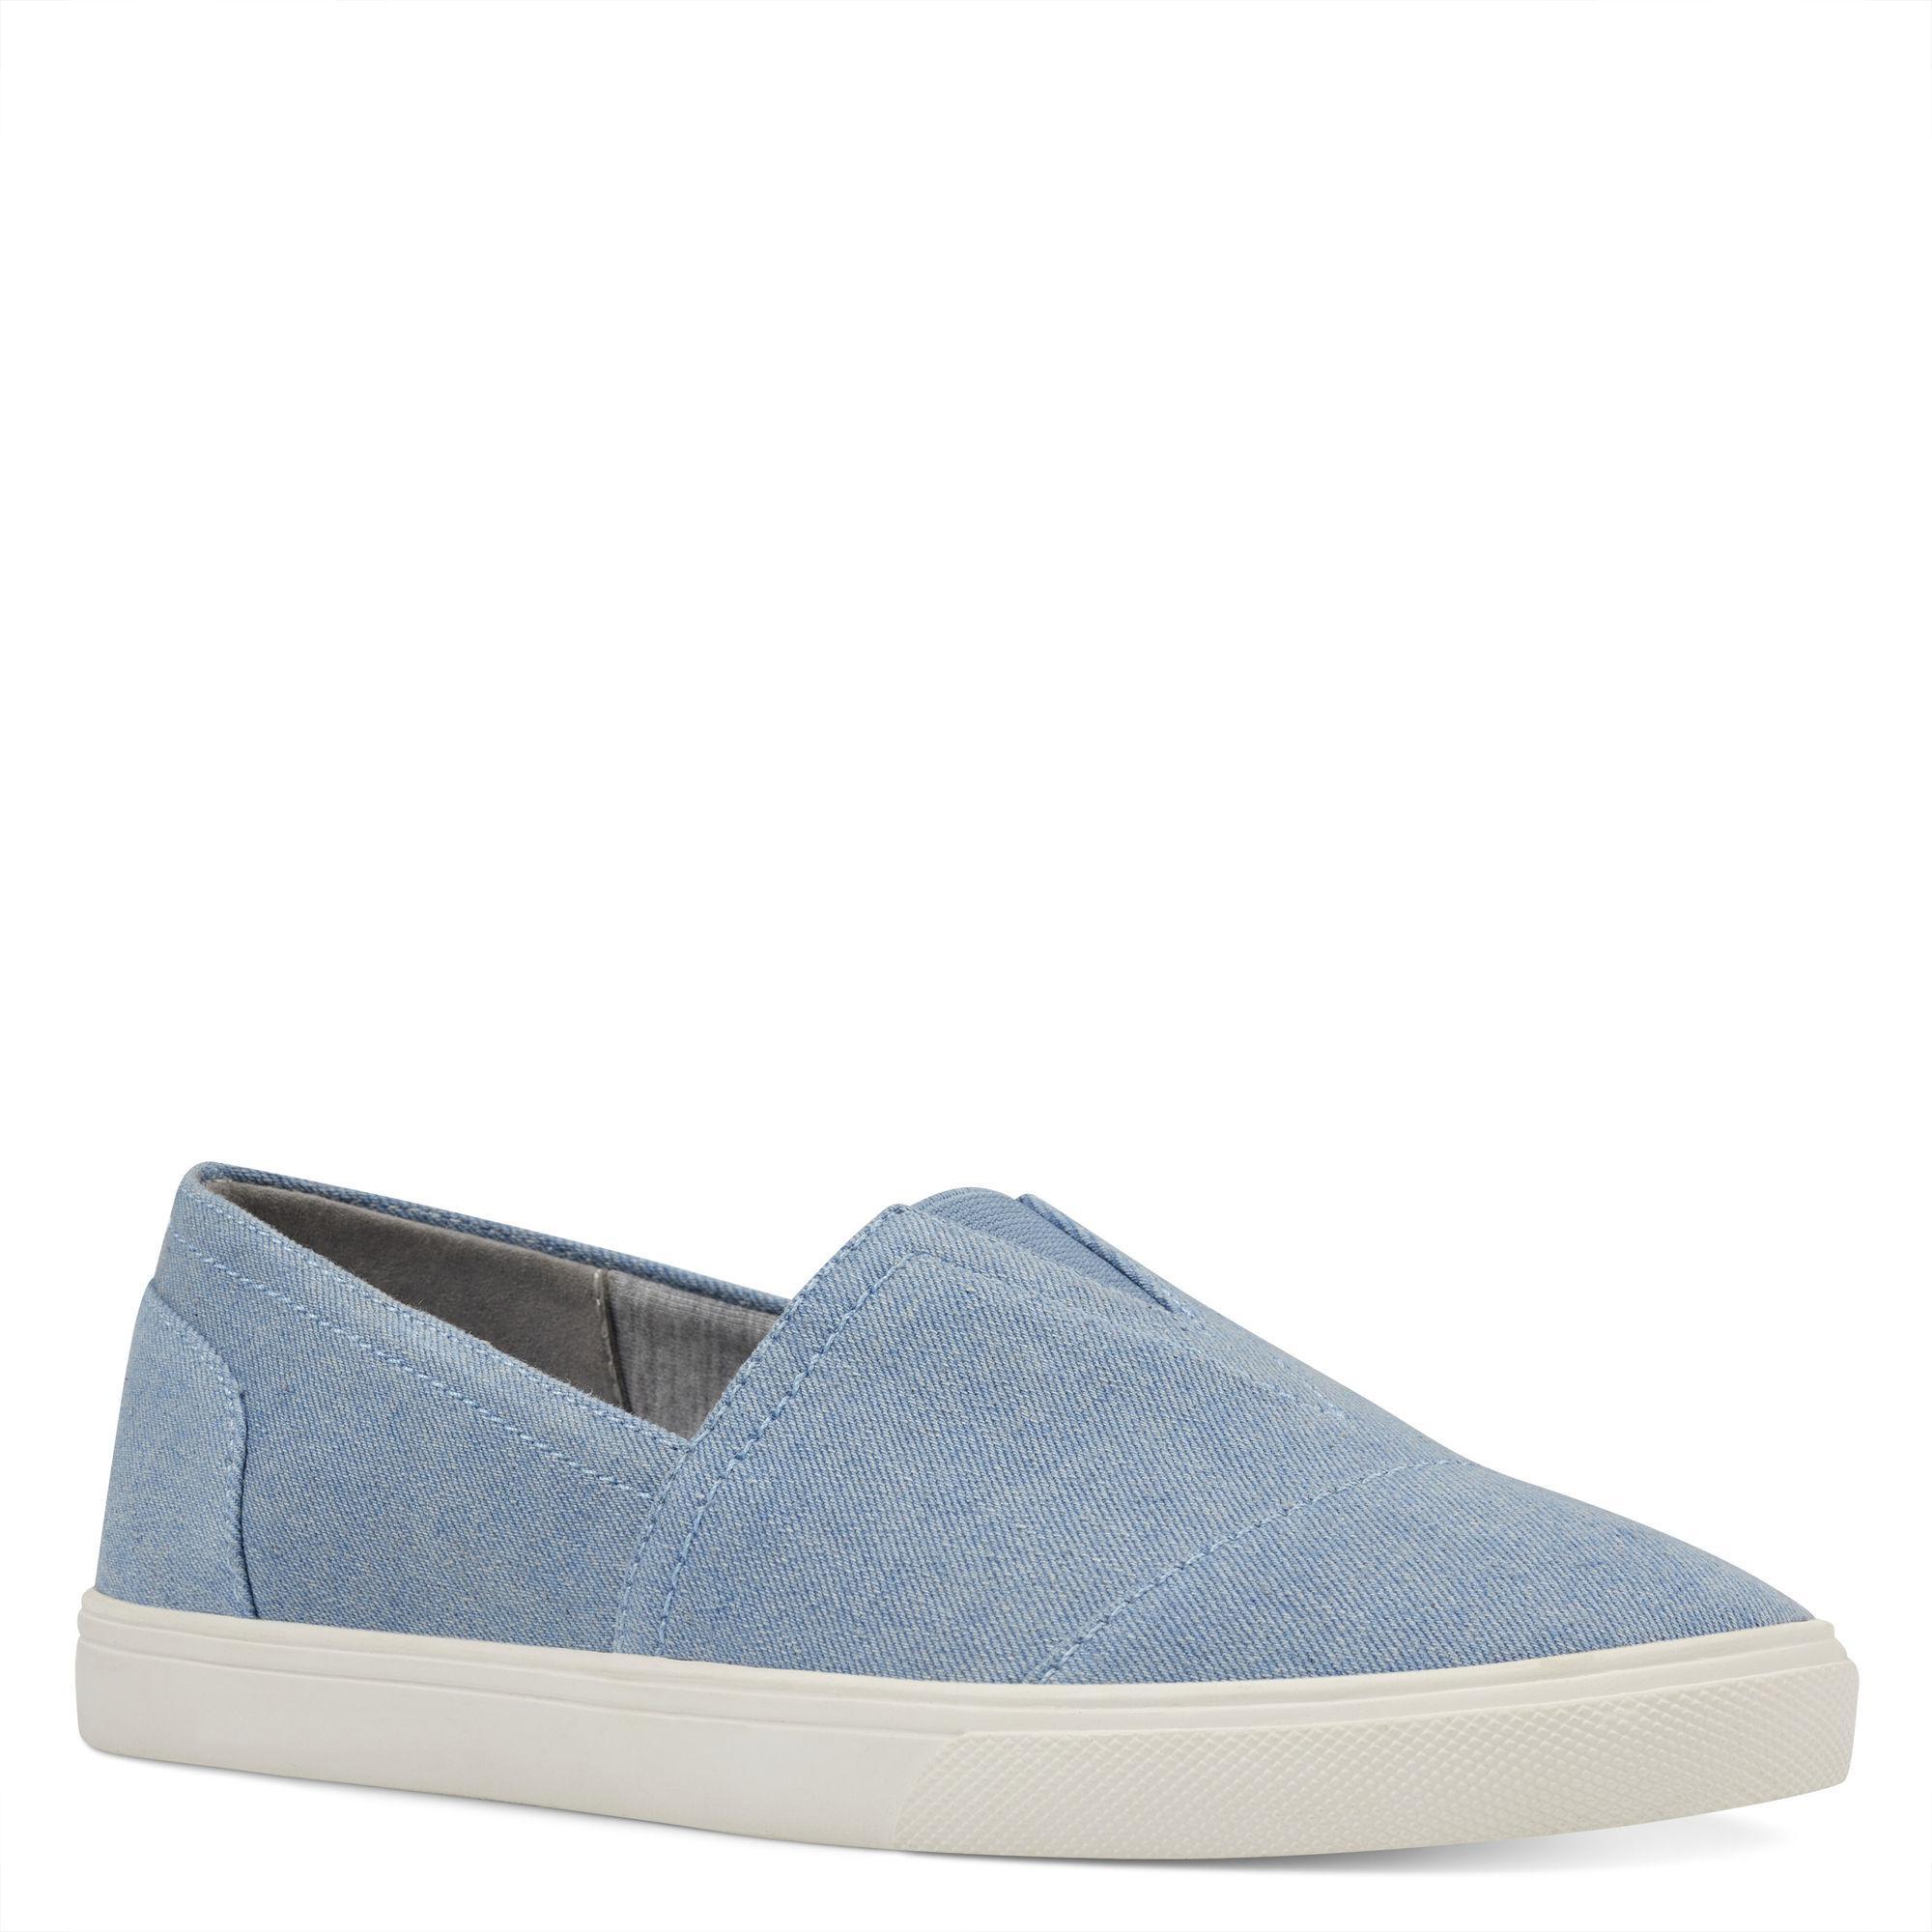 c031c62b073 Lyst - Nine West Bolla Slip-on Sneakers in Blue